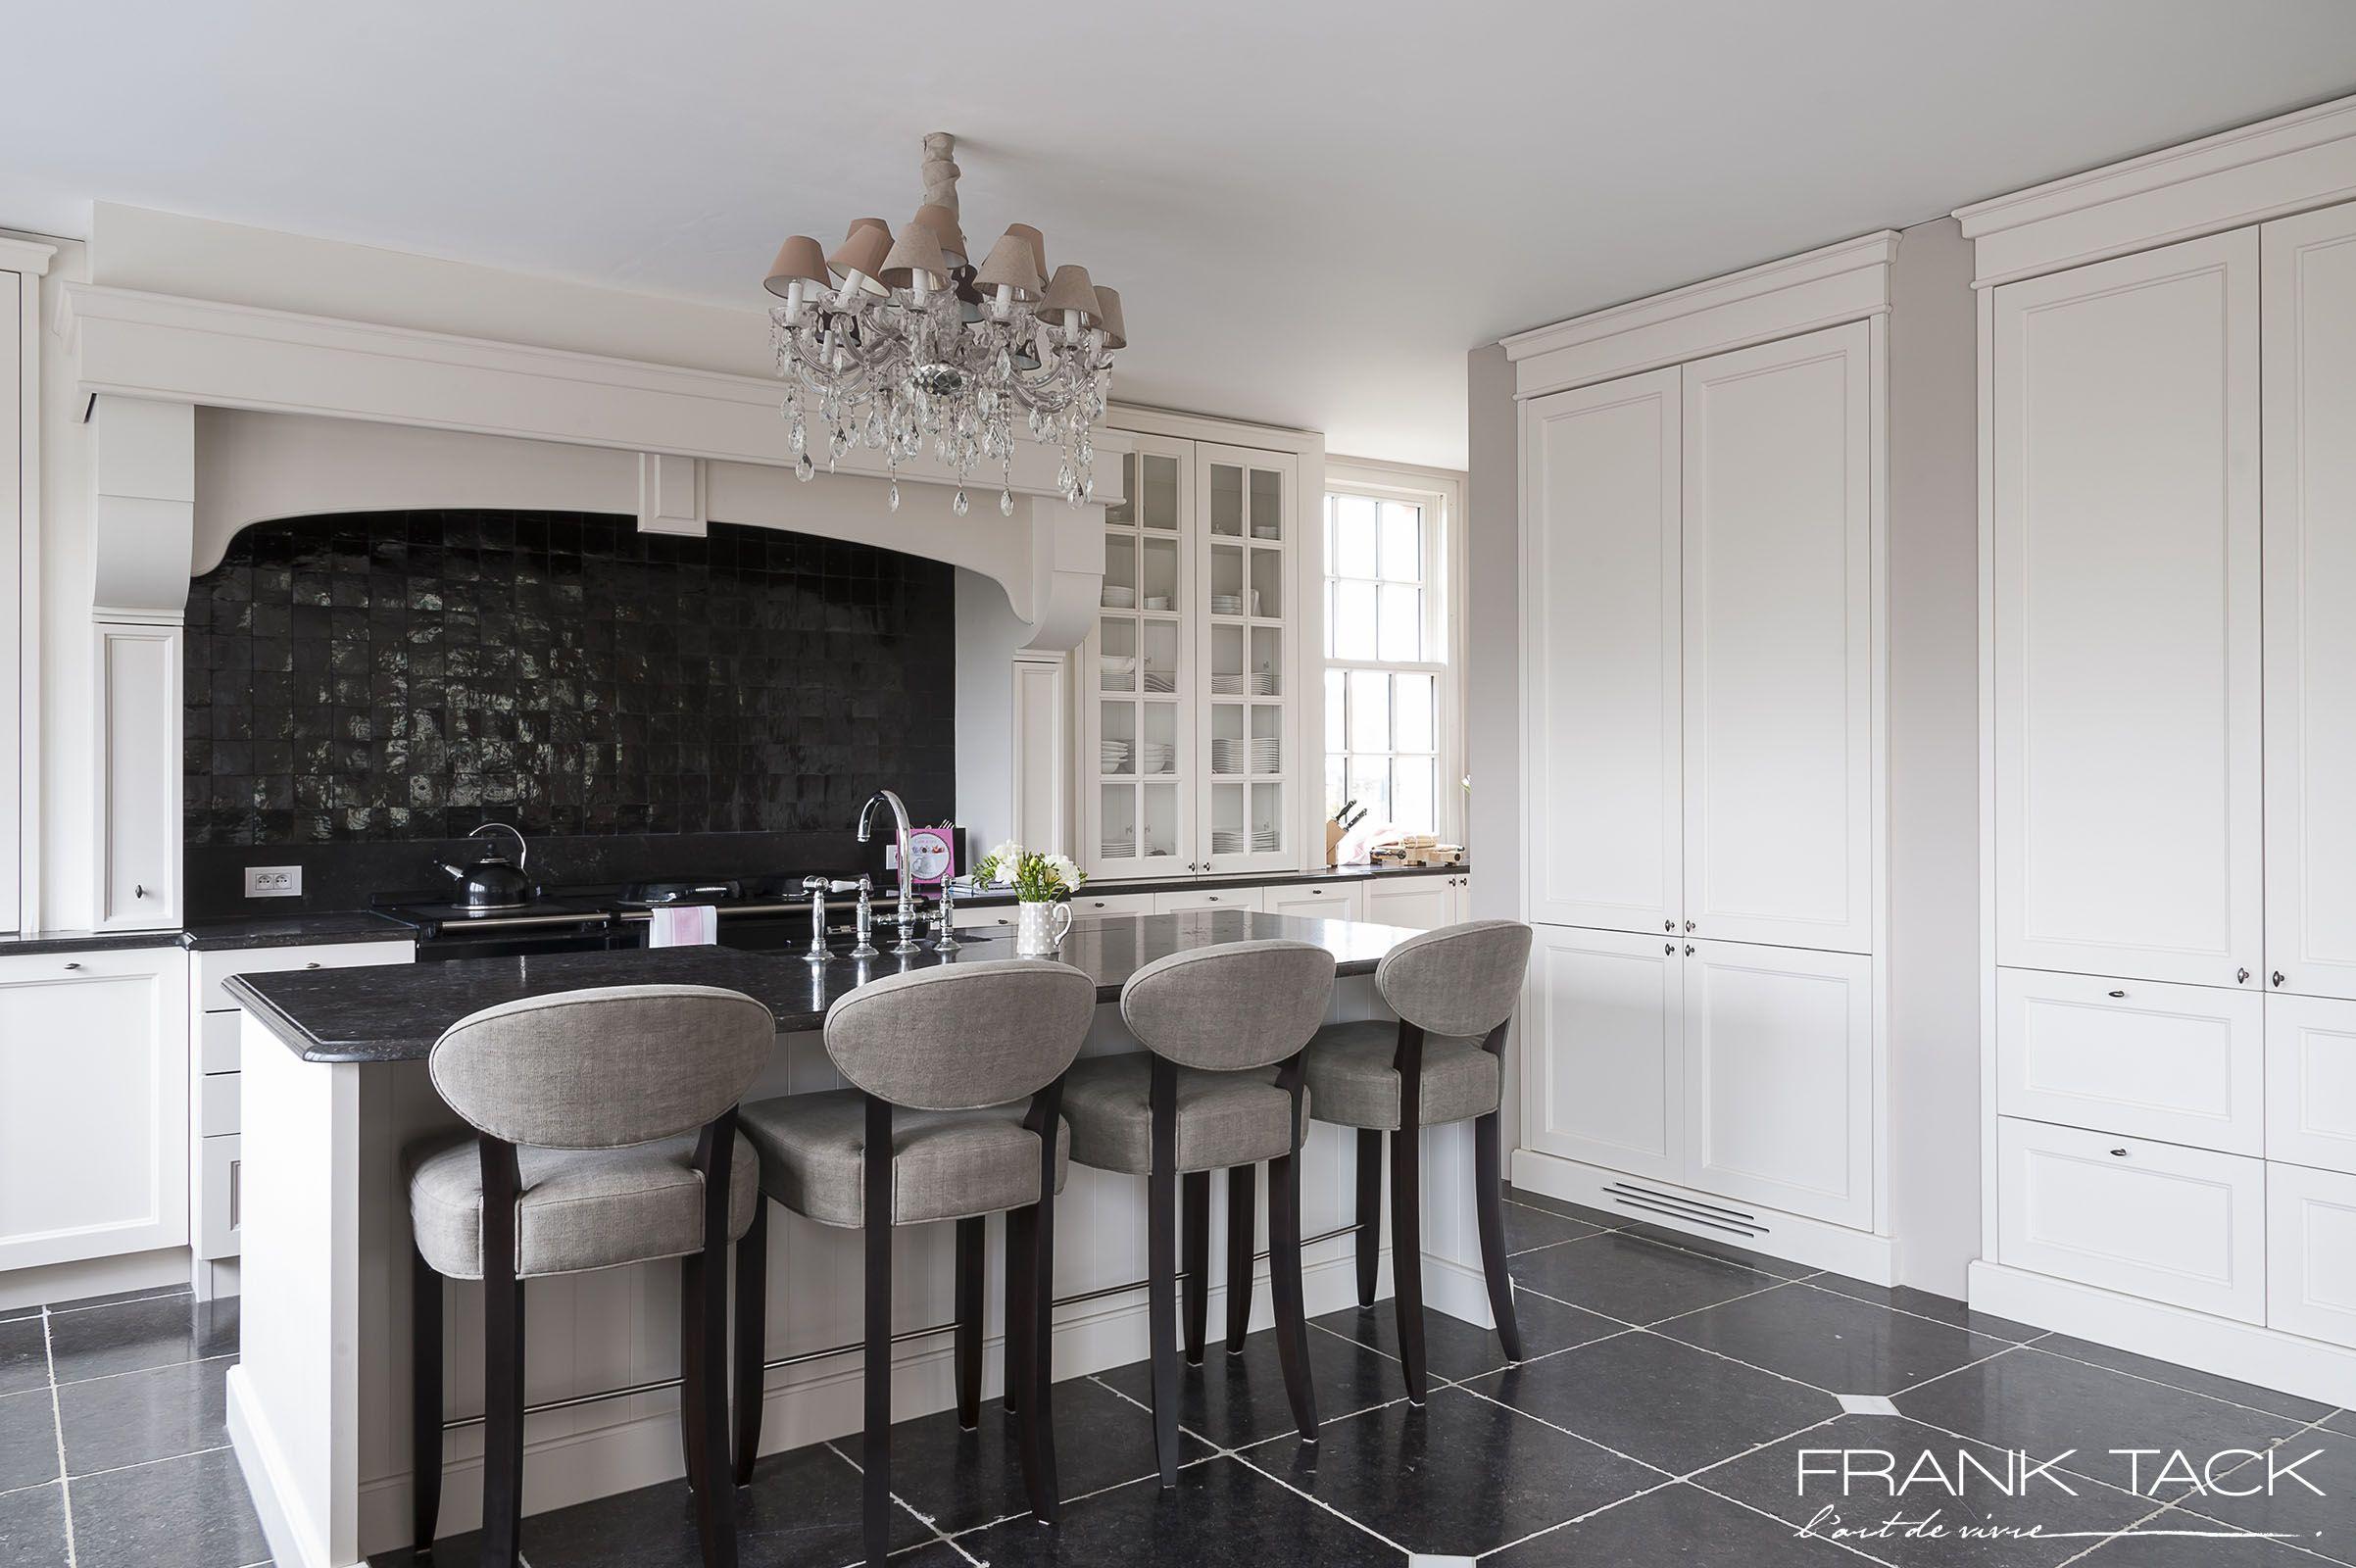 Keukens - Landelijk - Frank Tack - L'art de vivre - #keukens #landelijk #franktack